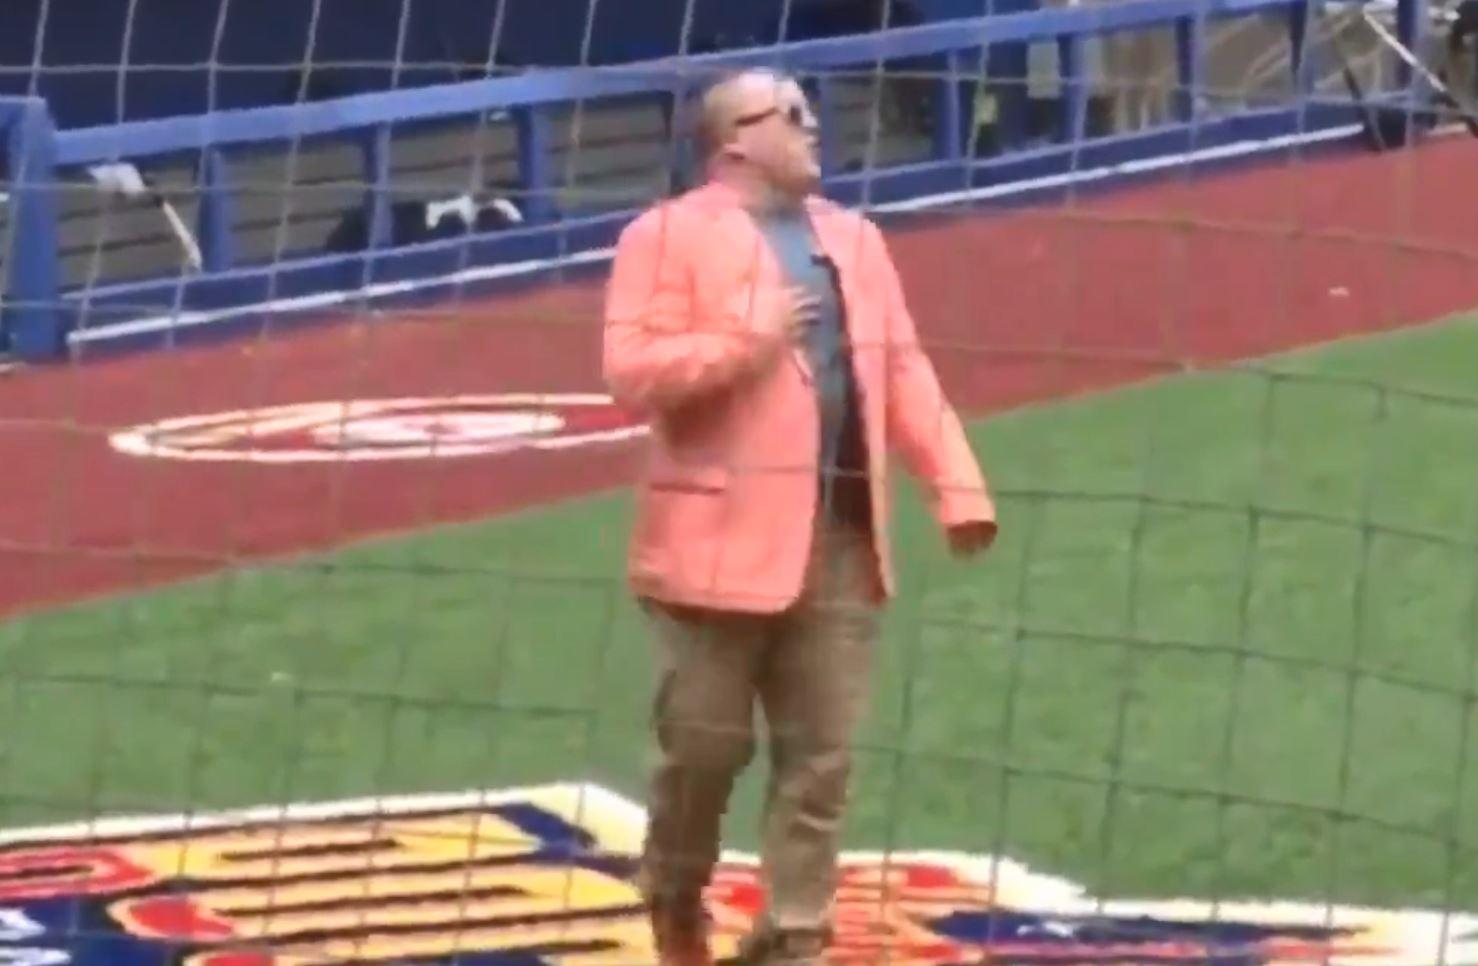 chuck hayworth horrible national anthem_1557232500278.JPG.jpg